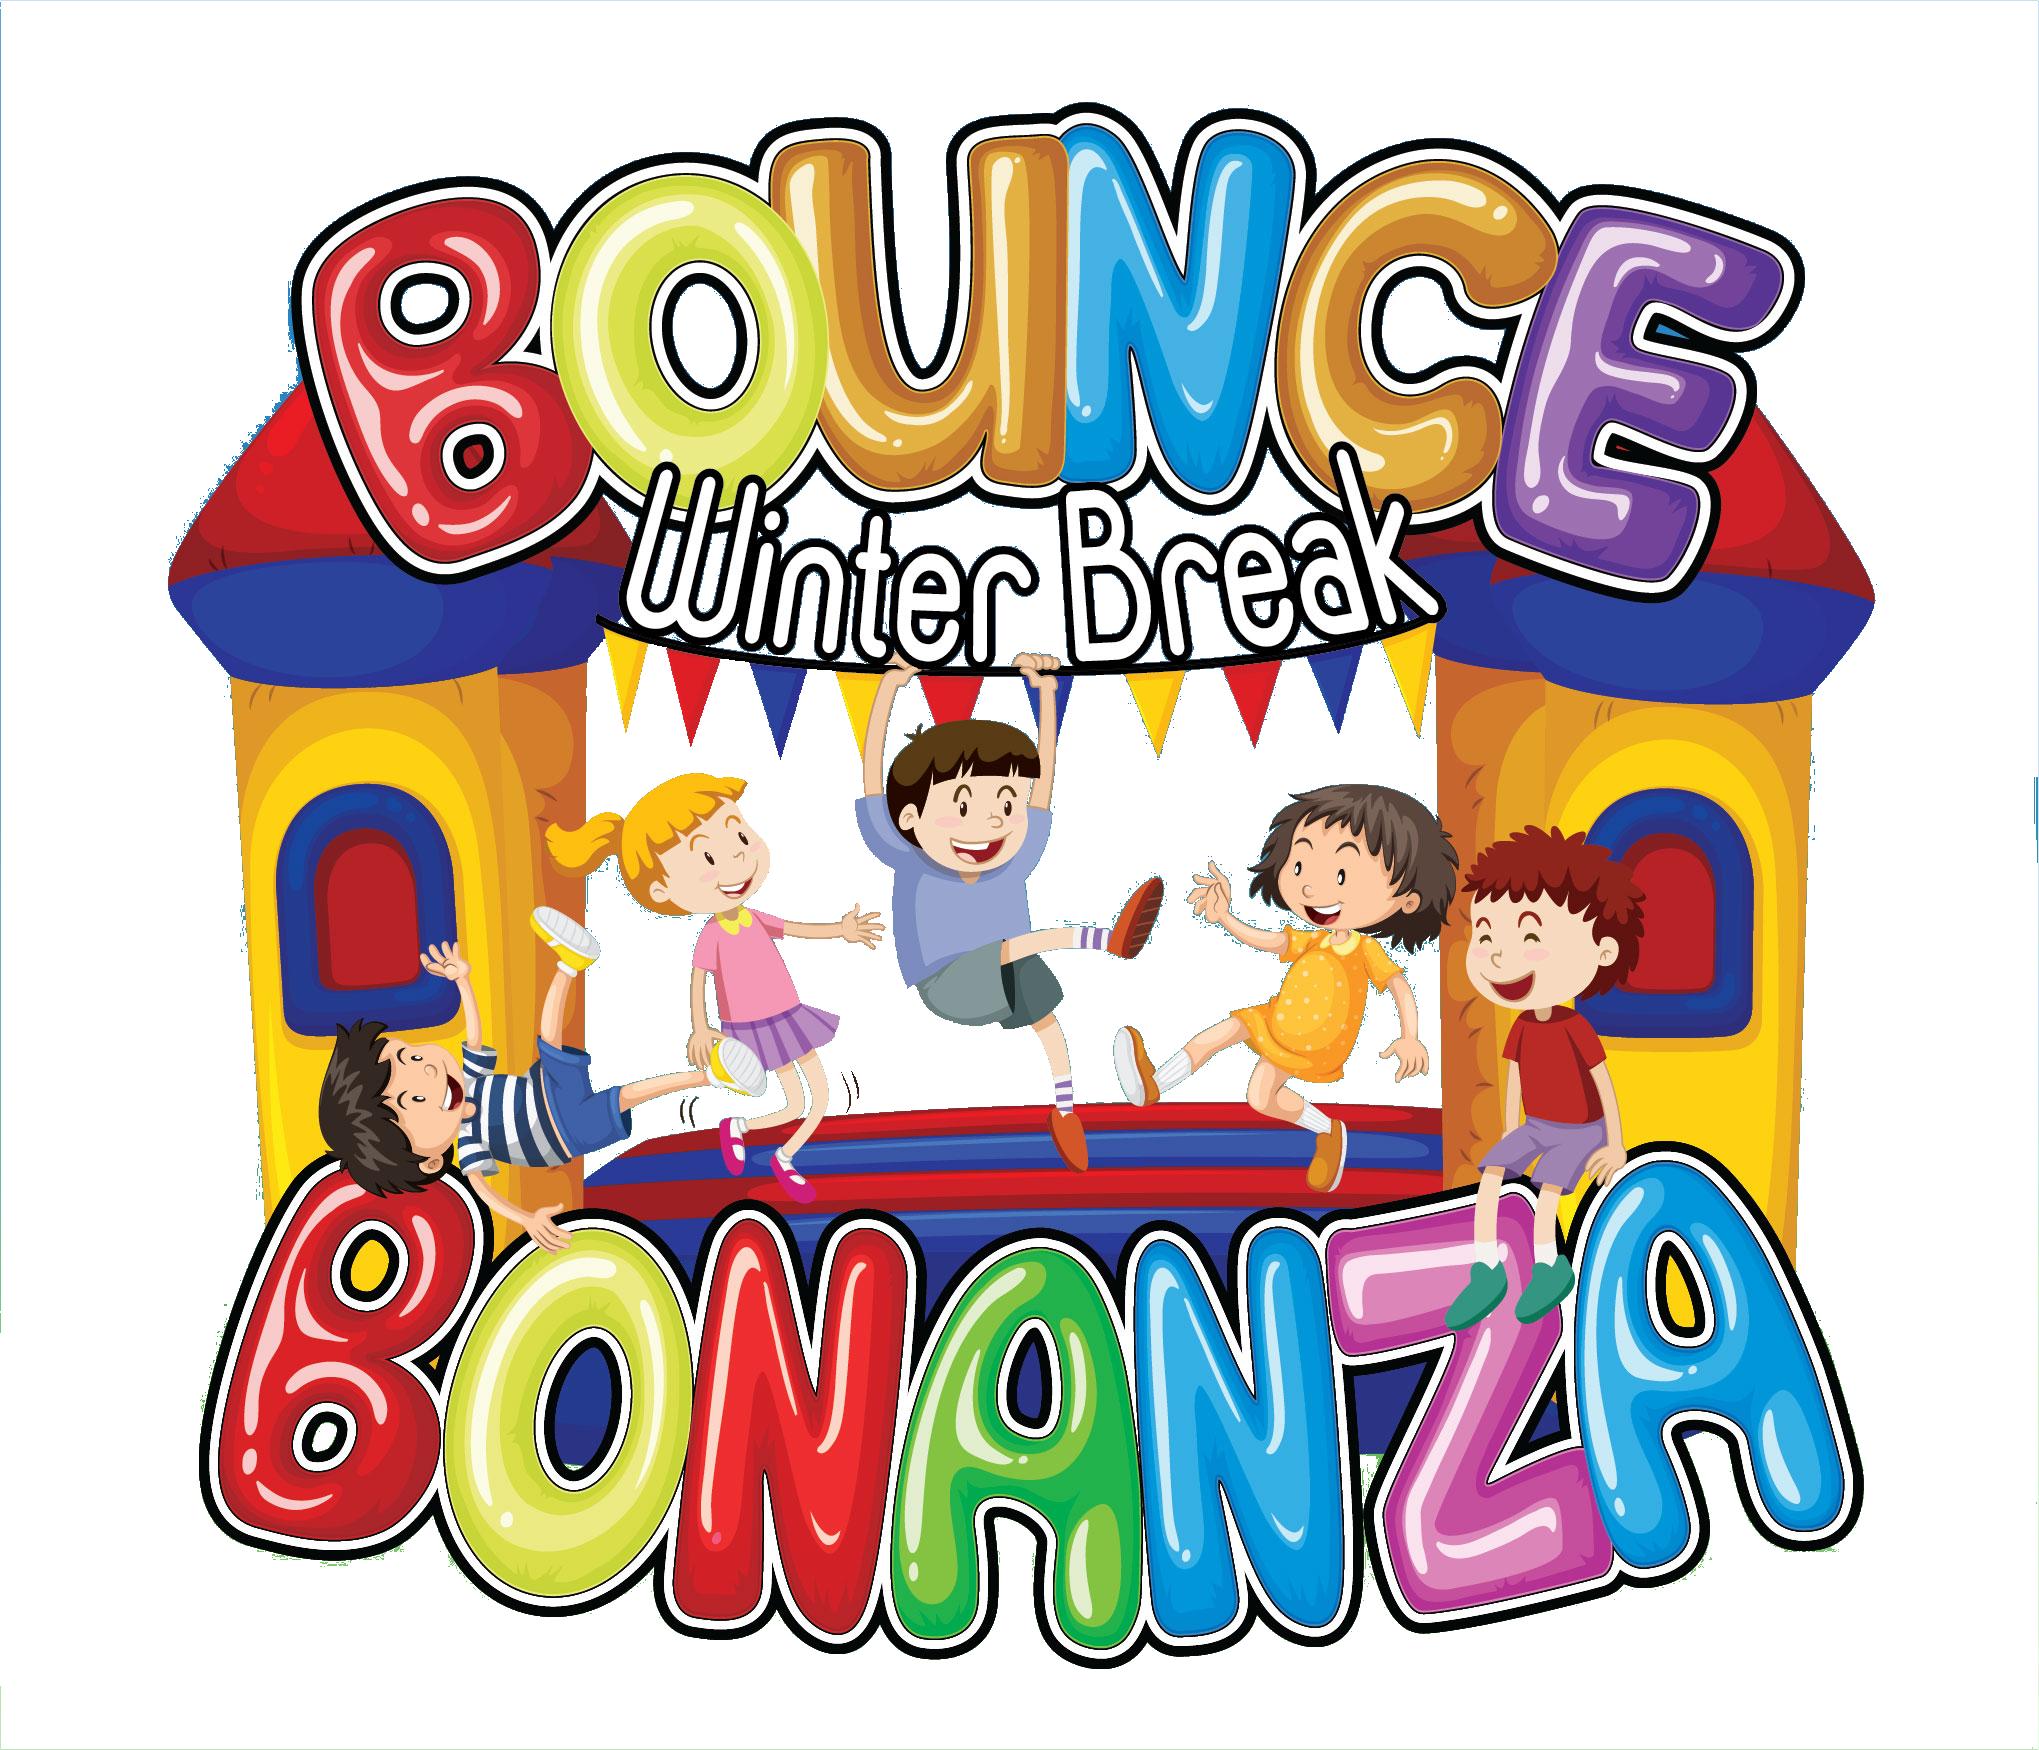 bounce bonanza